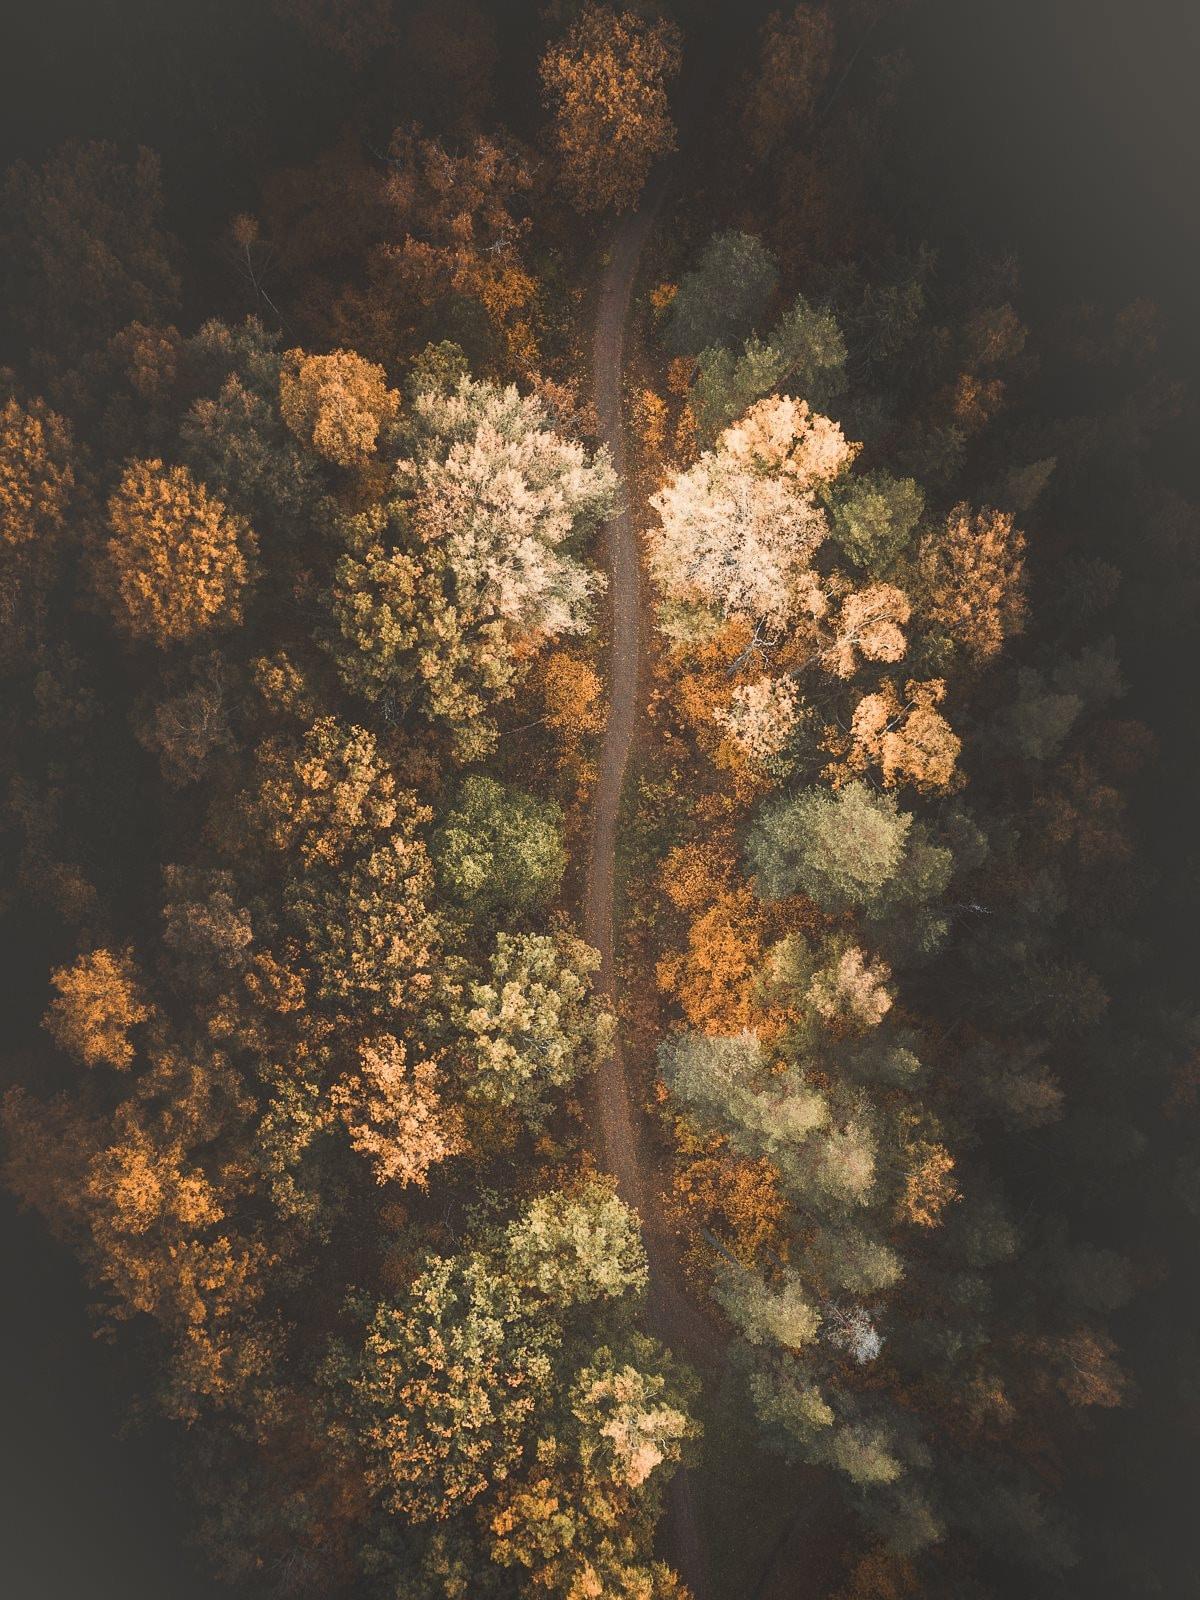 tobias hagg aerial photography 7